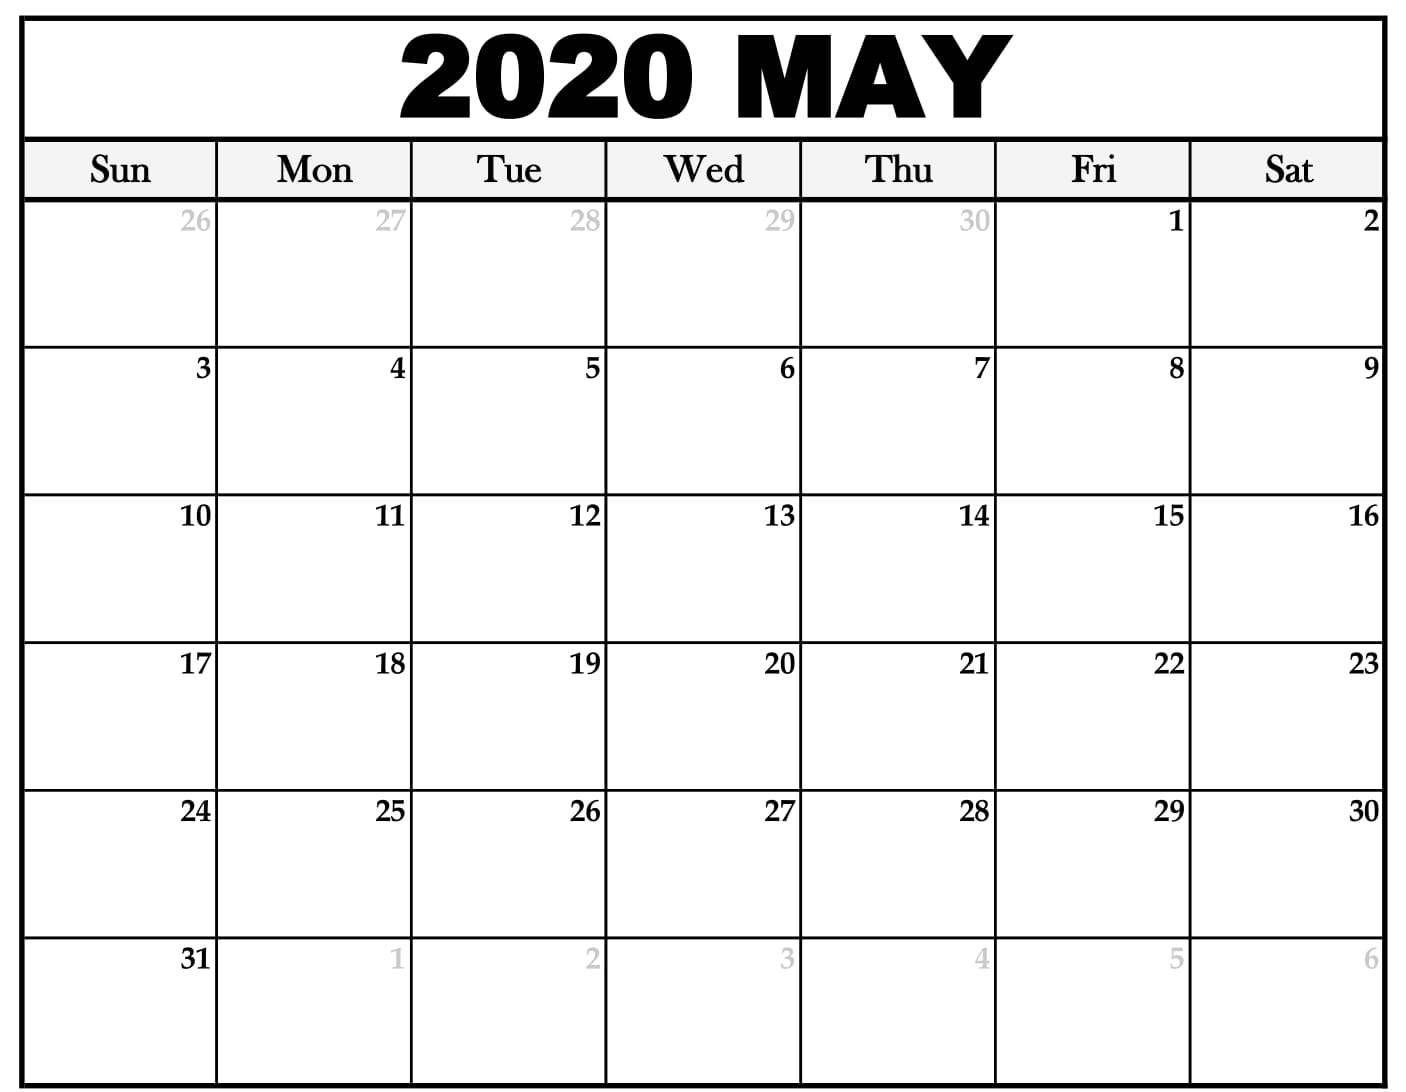 May 2020 Calendar Template Word